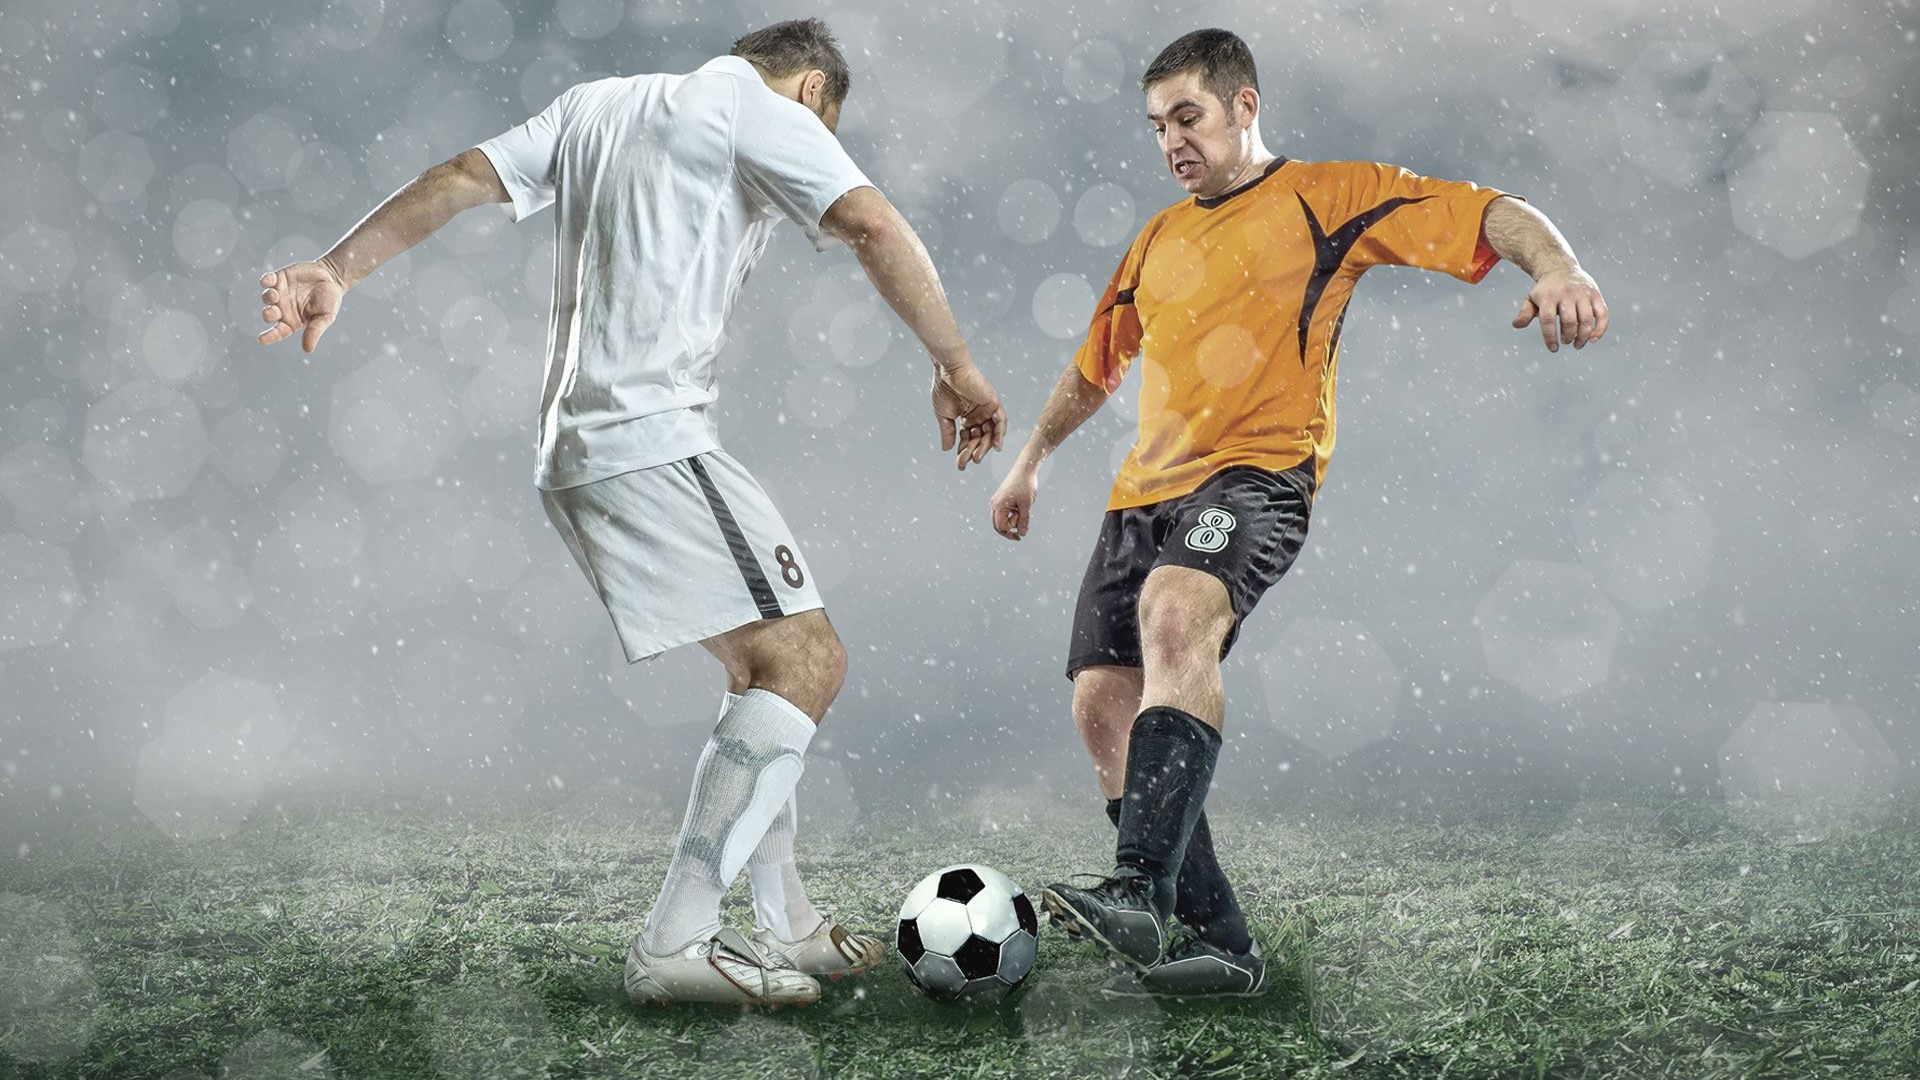 bristol-rugby-vs-worcester-warriors-live